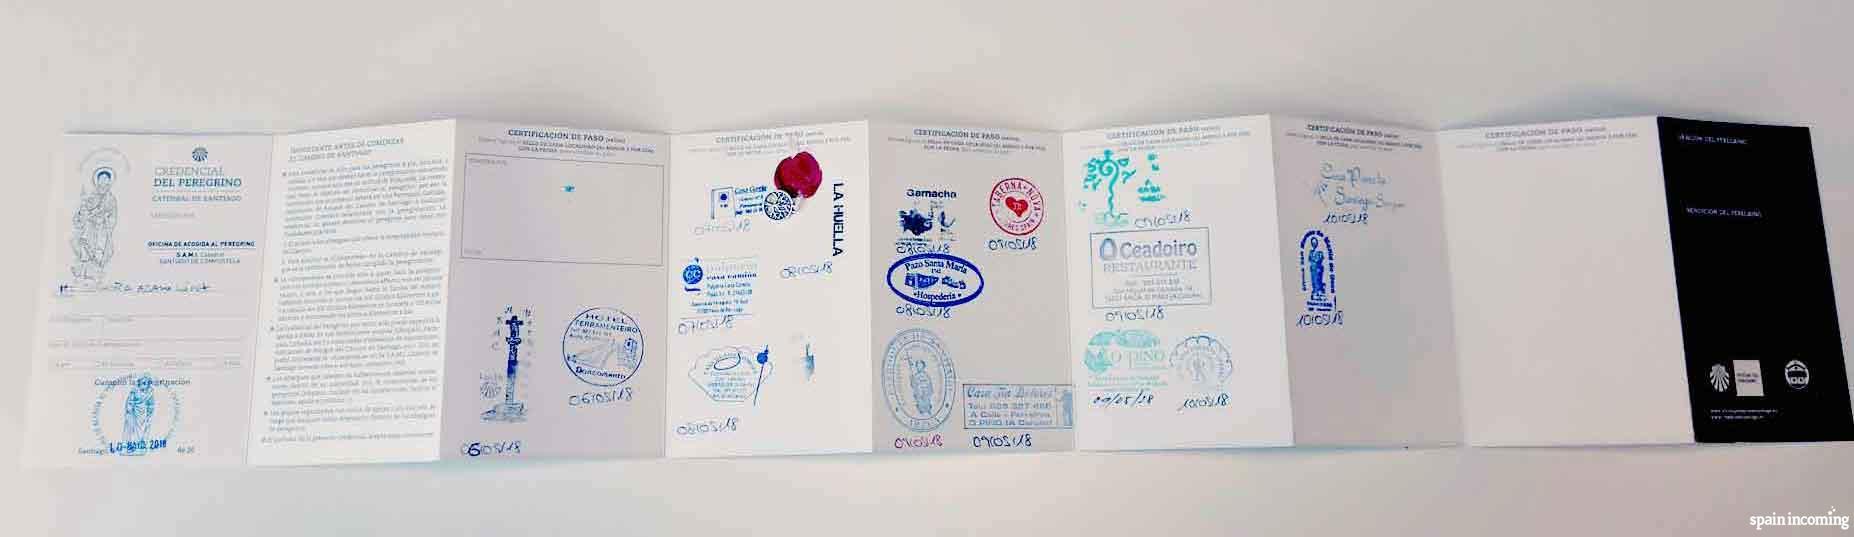 The Credential, the Pilgrim's Passport - The Credential